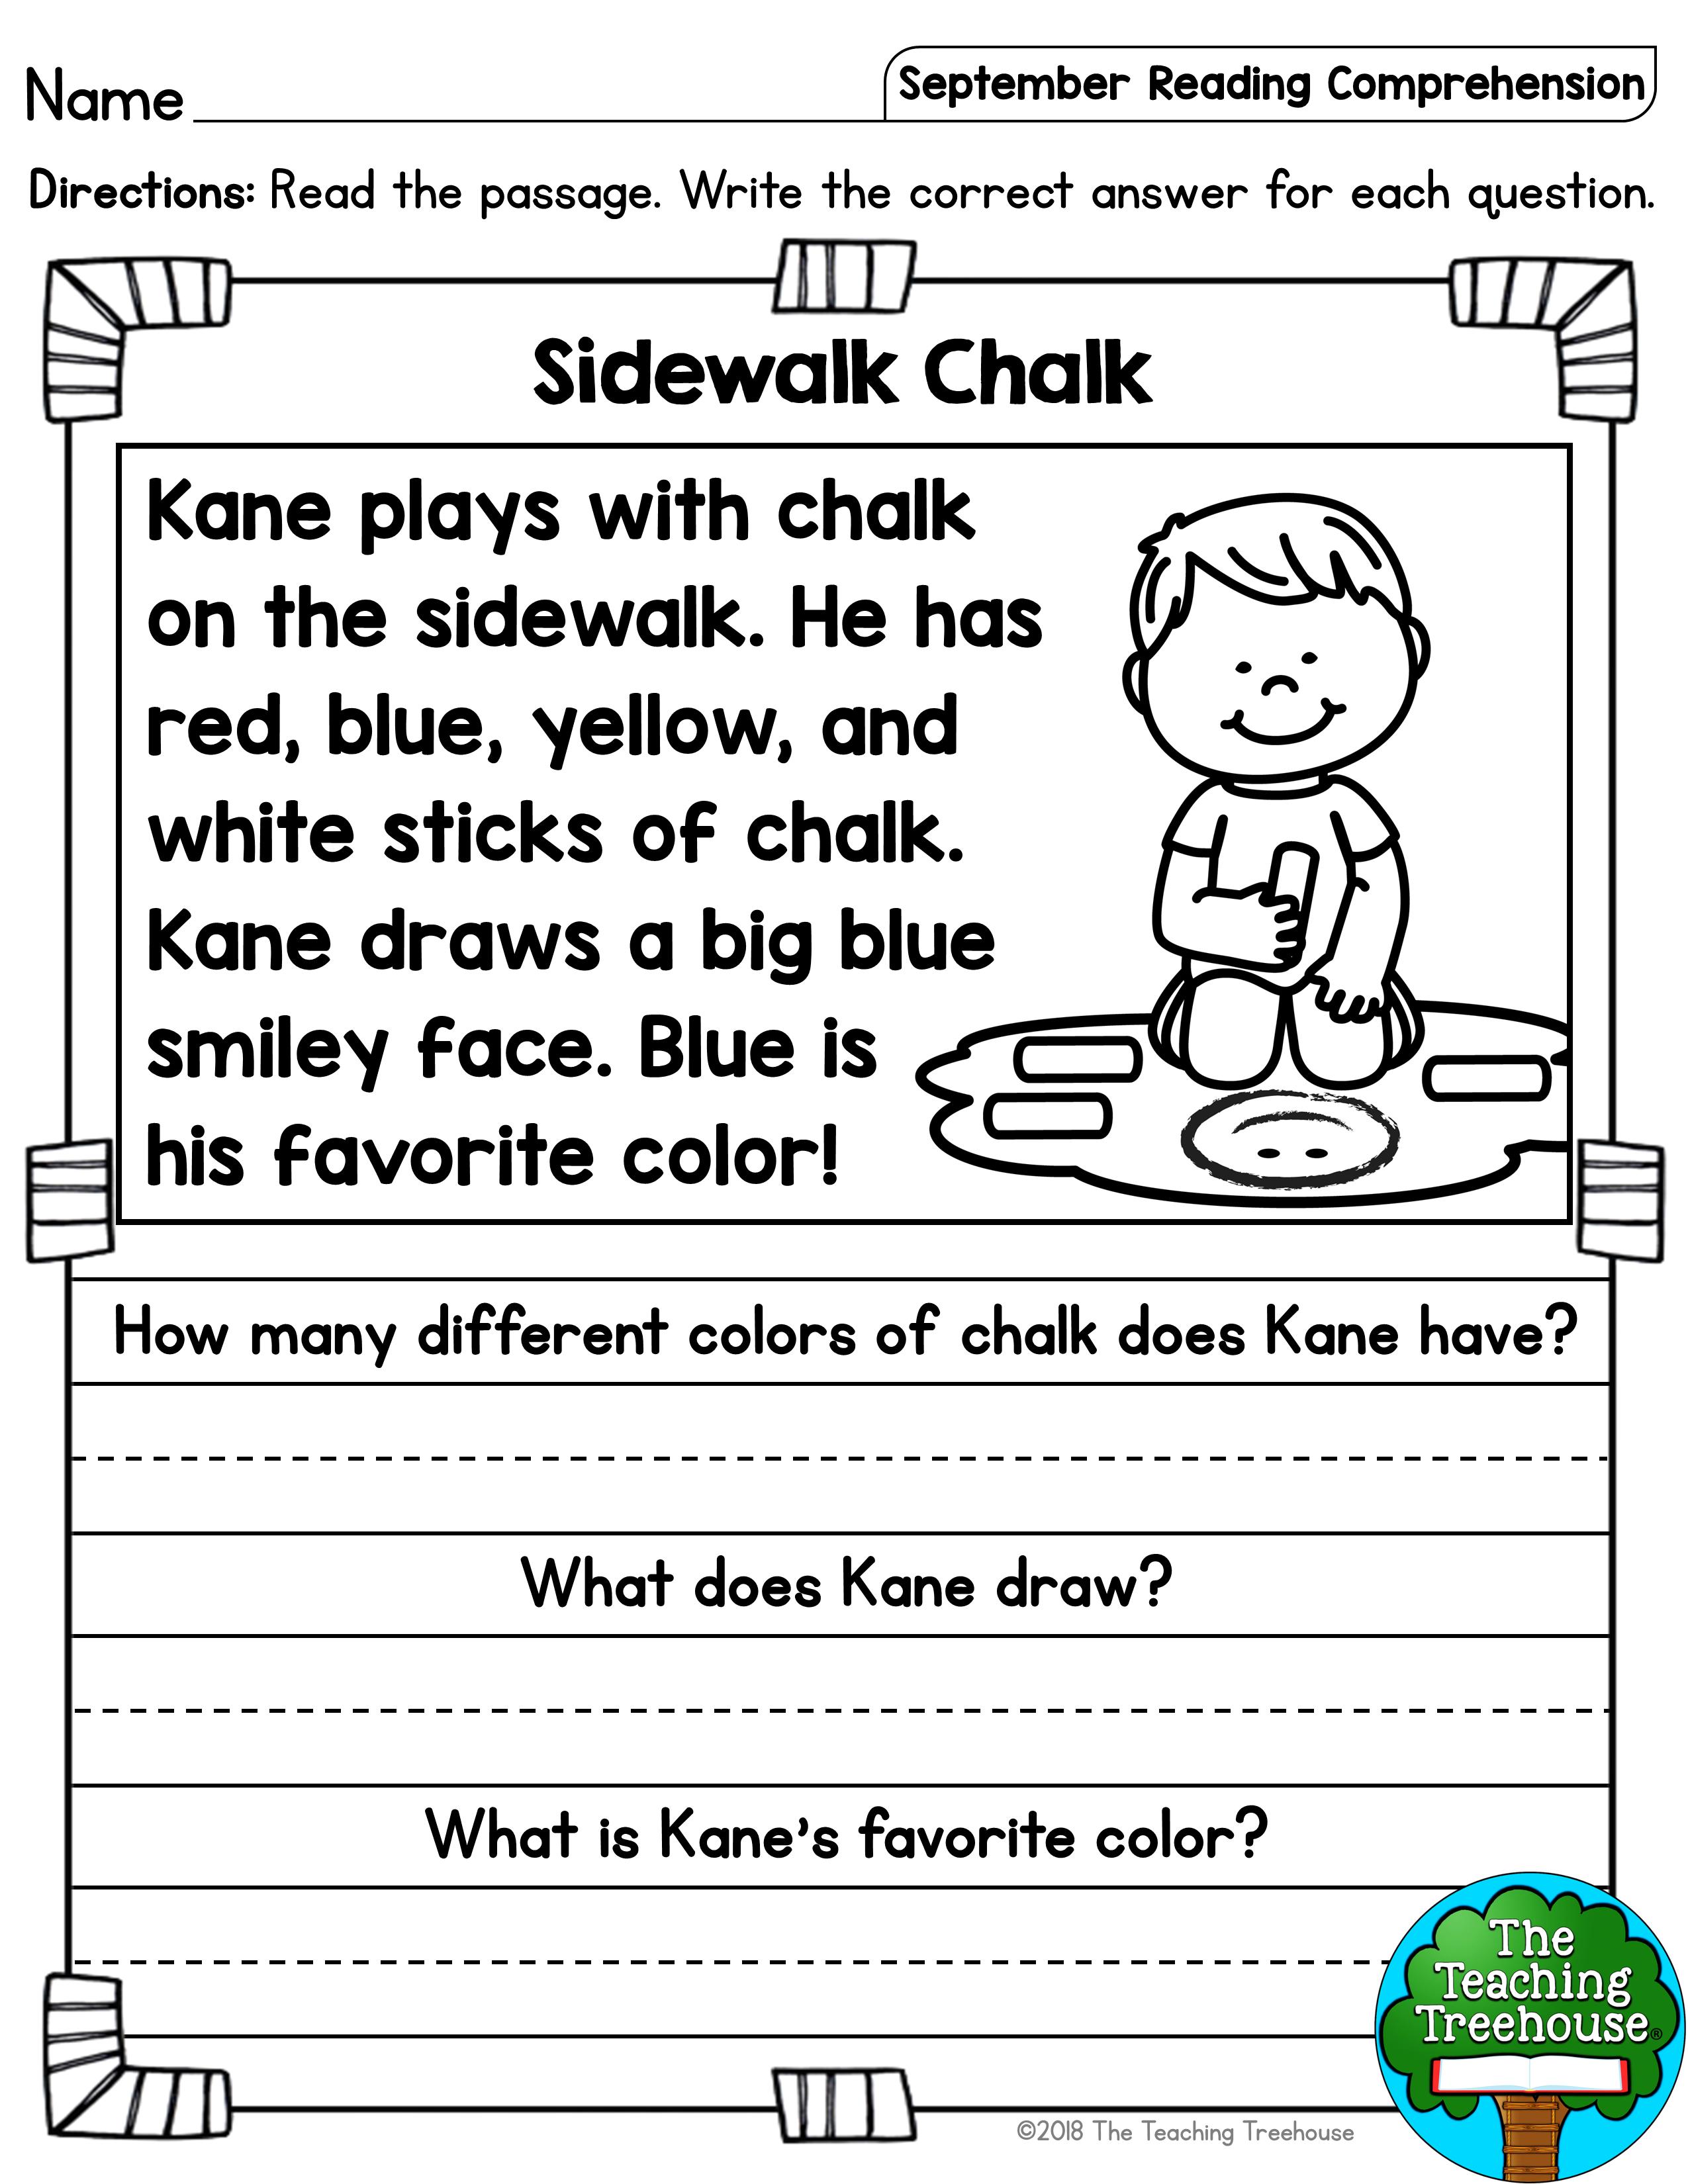 September Reading Comprehension Passages for Kindergarten and First Grade    Reading comprehension [ 3300 x 2550 Pixel ]